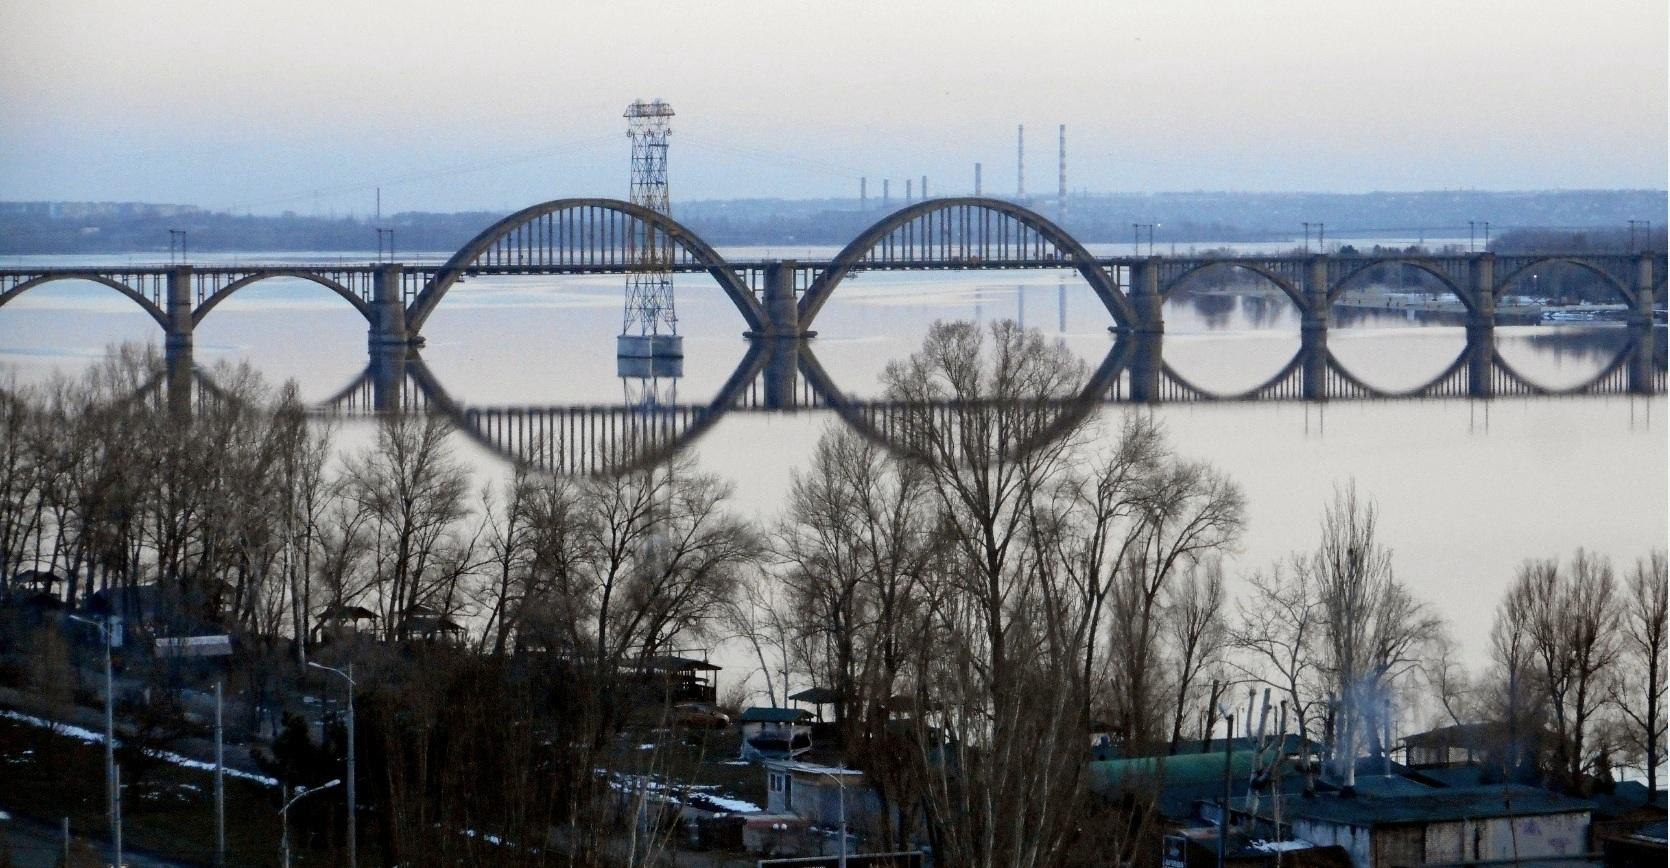 Геометрия Мерефо-Херсонского моста